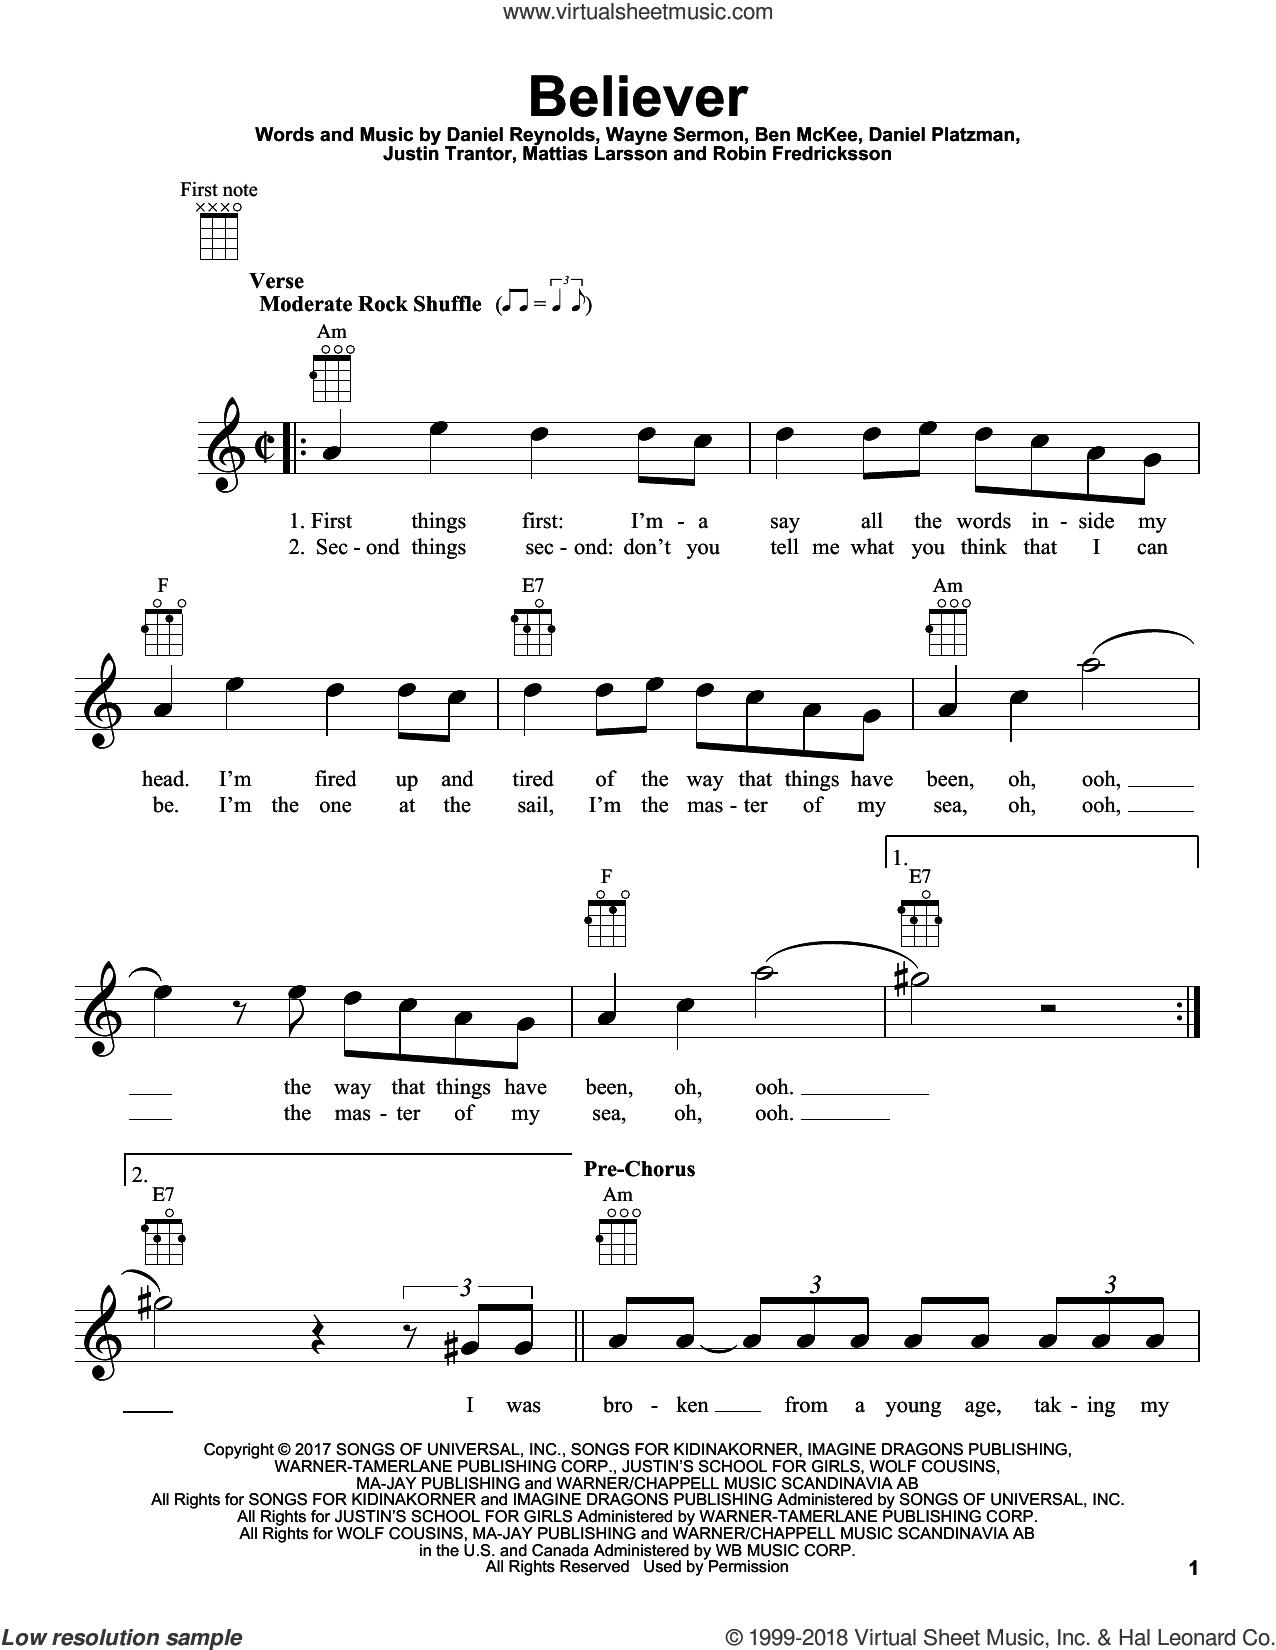 Believer sheet music for ukulele by Imagine Dragons, Ben McKee, Dan Reynolds, Daniel Platzman, Justin Tranter, Mattias Larsson, Robin Fredriksson and Wayne Sermon, intermediate skill level